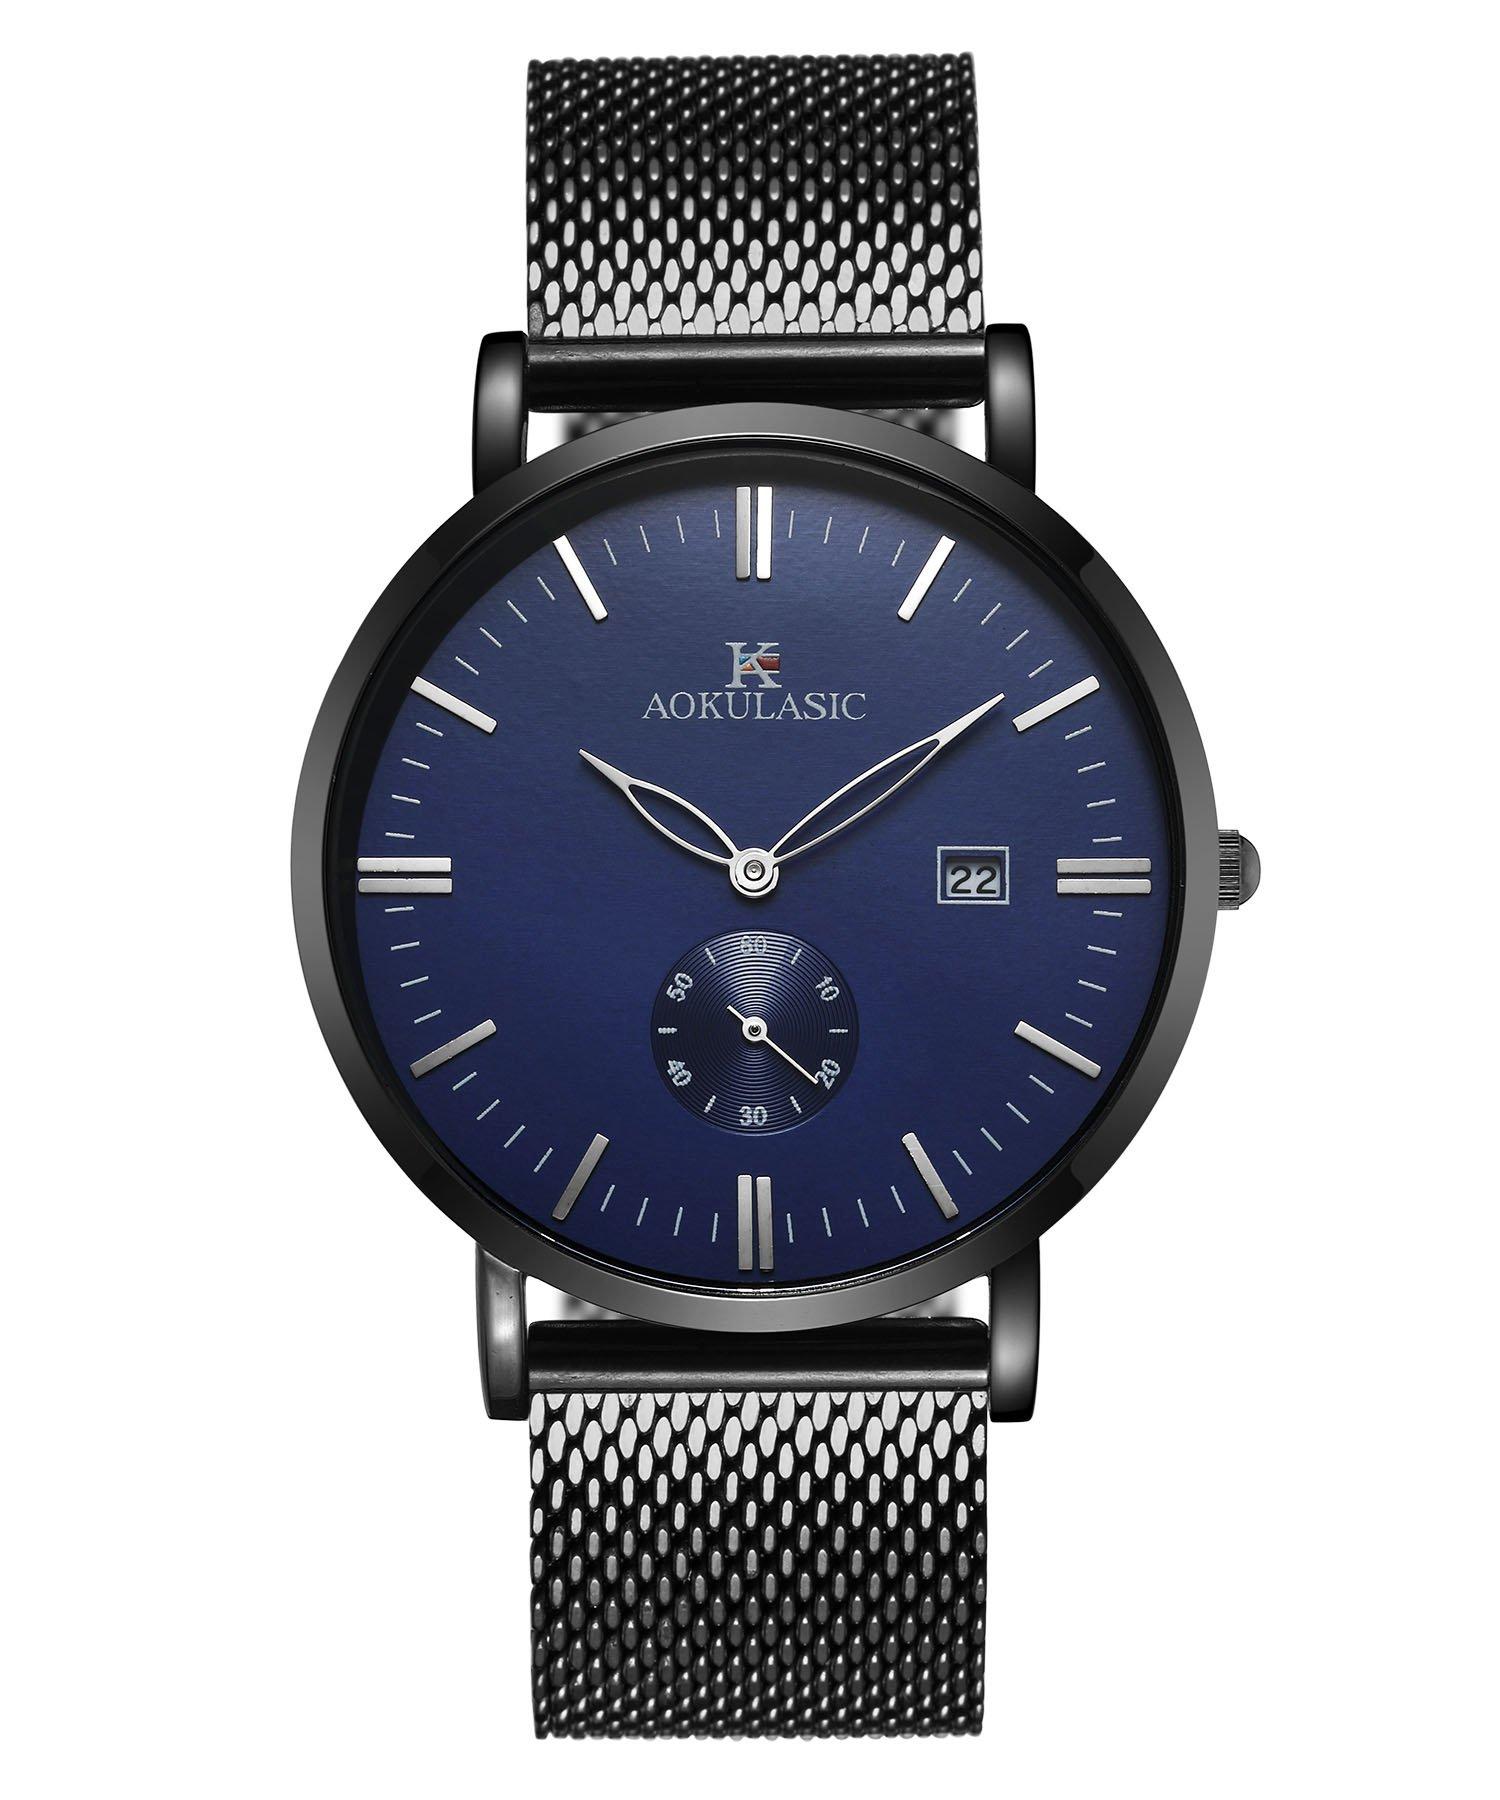 AOKULASIC Mens Fashion Fecha Analógica Cuarzo Resistente al Agua muñeca Reloj con Especial Segunda Sub Dial. (Azul Negro)